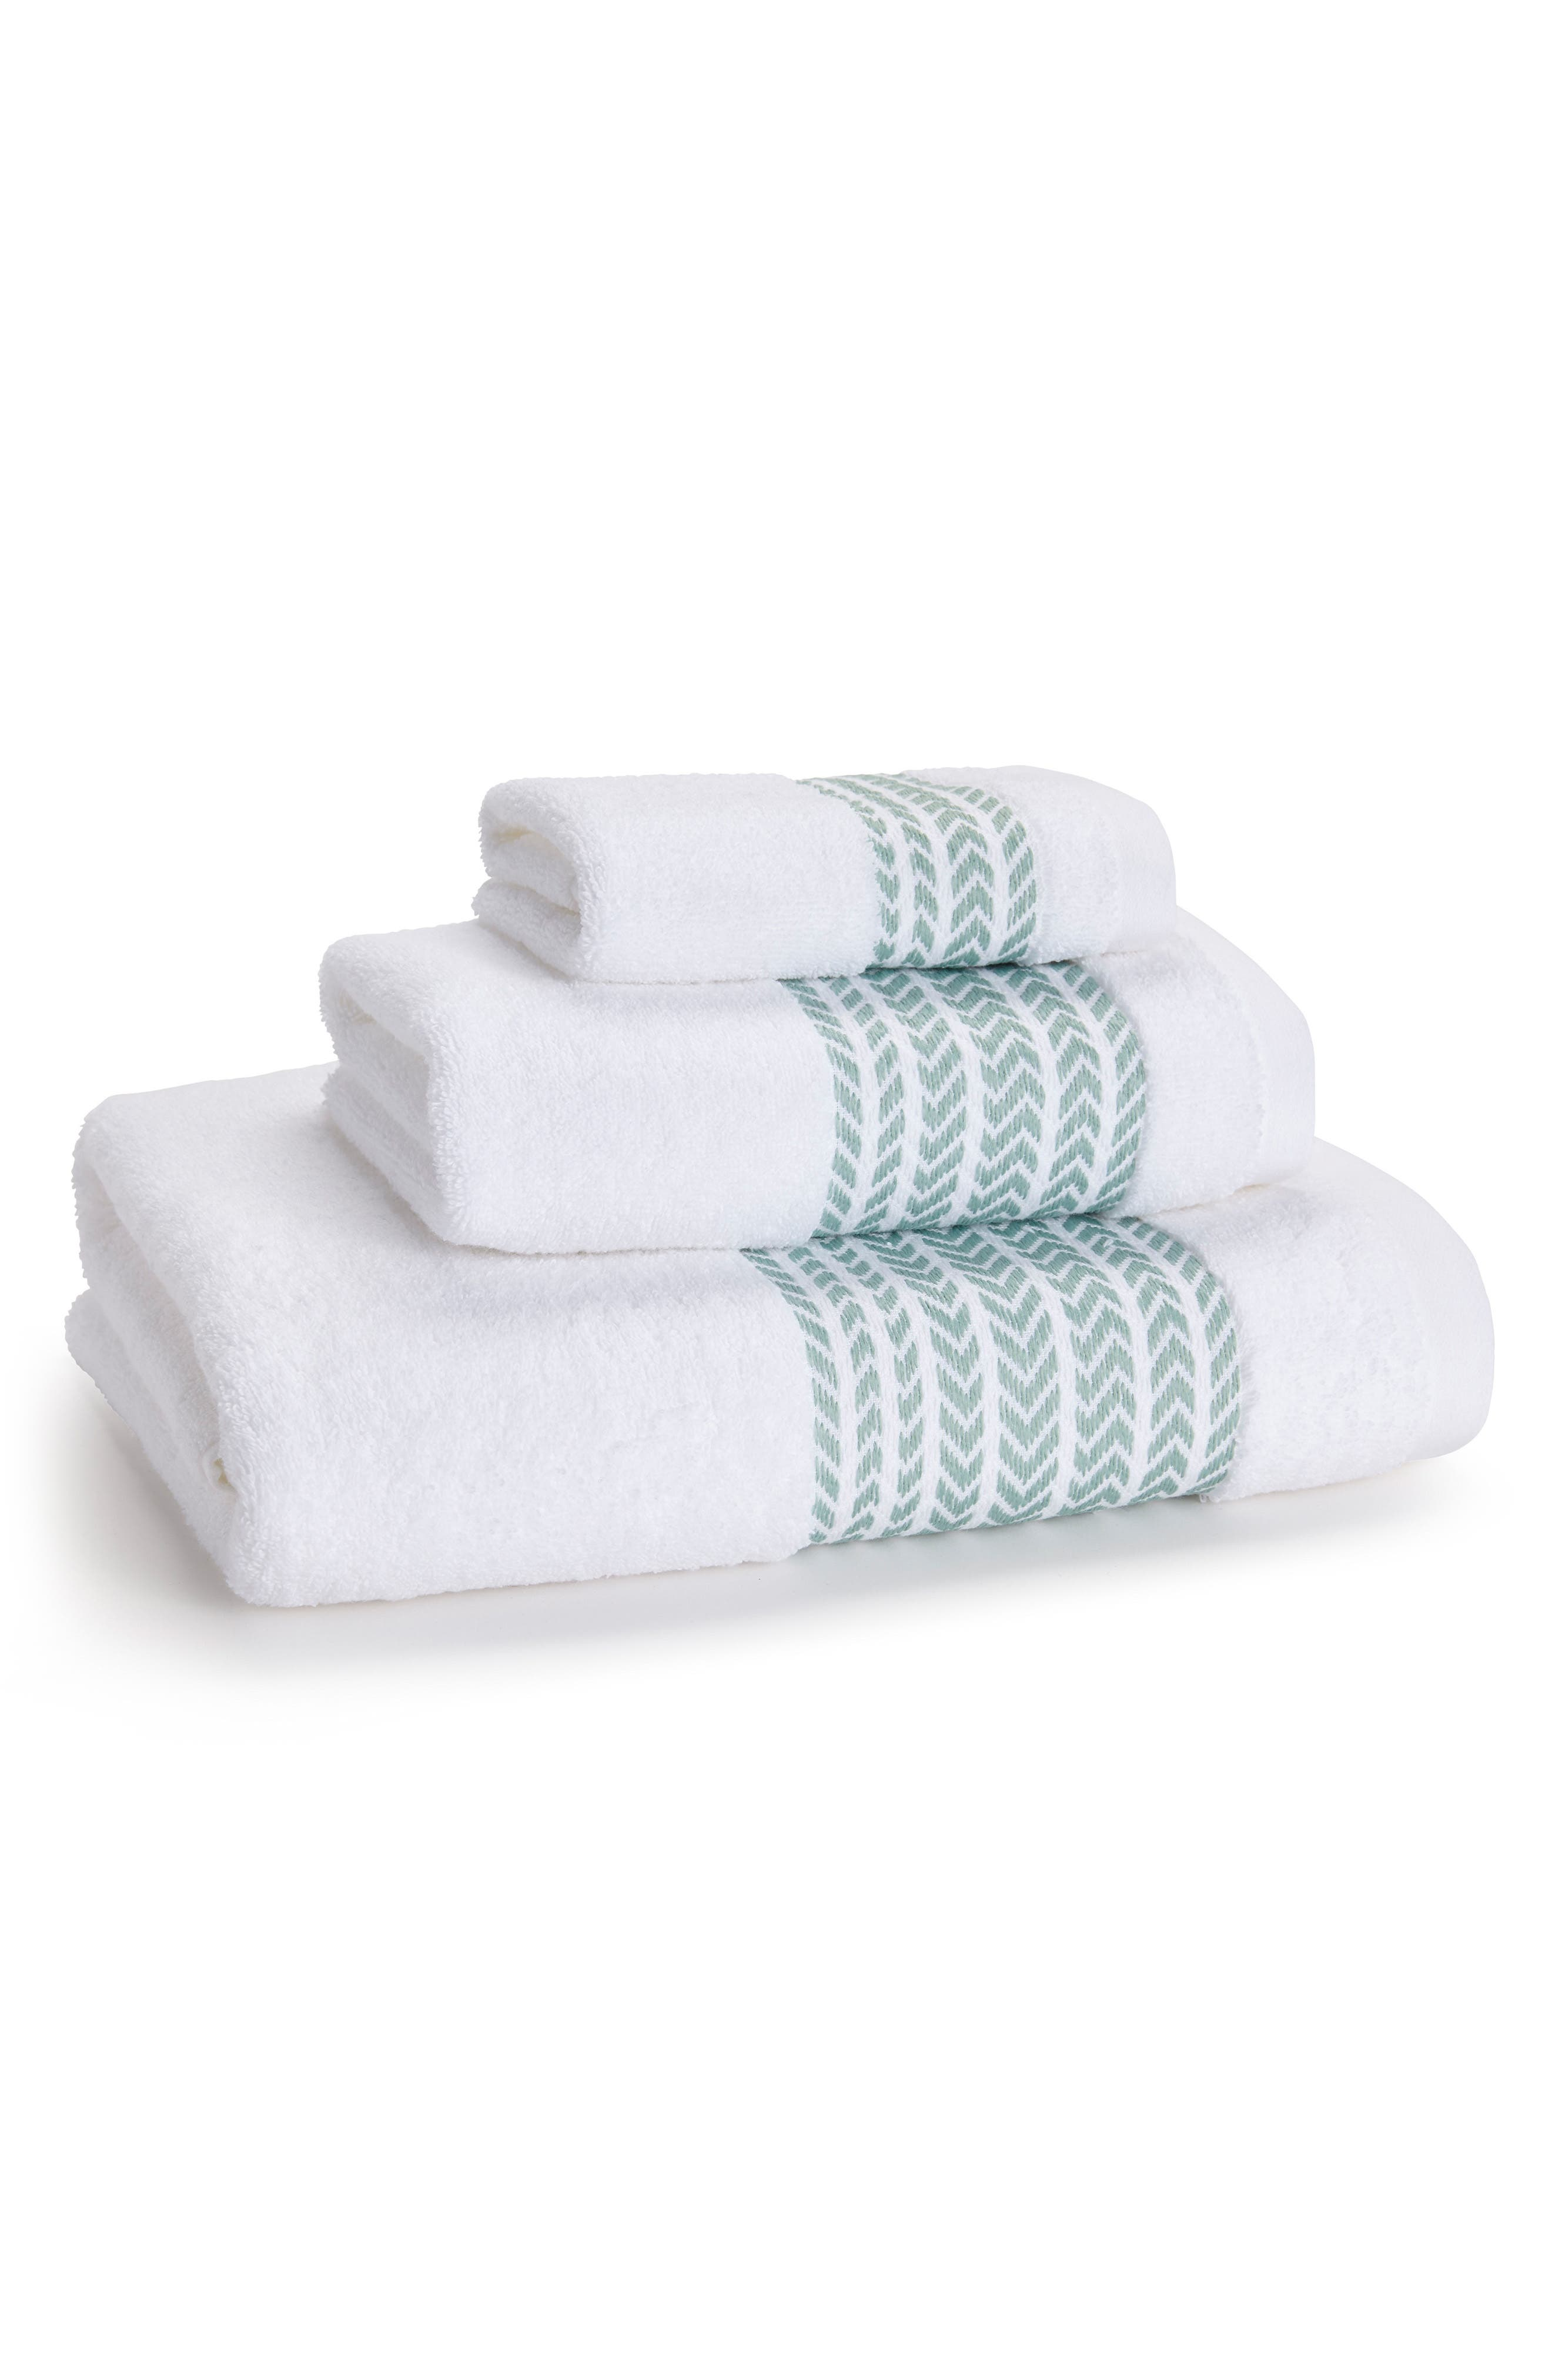 KASSATEX Baja Bath Towel